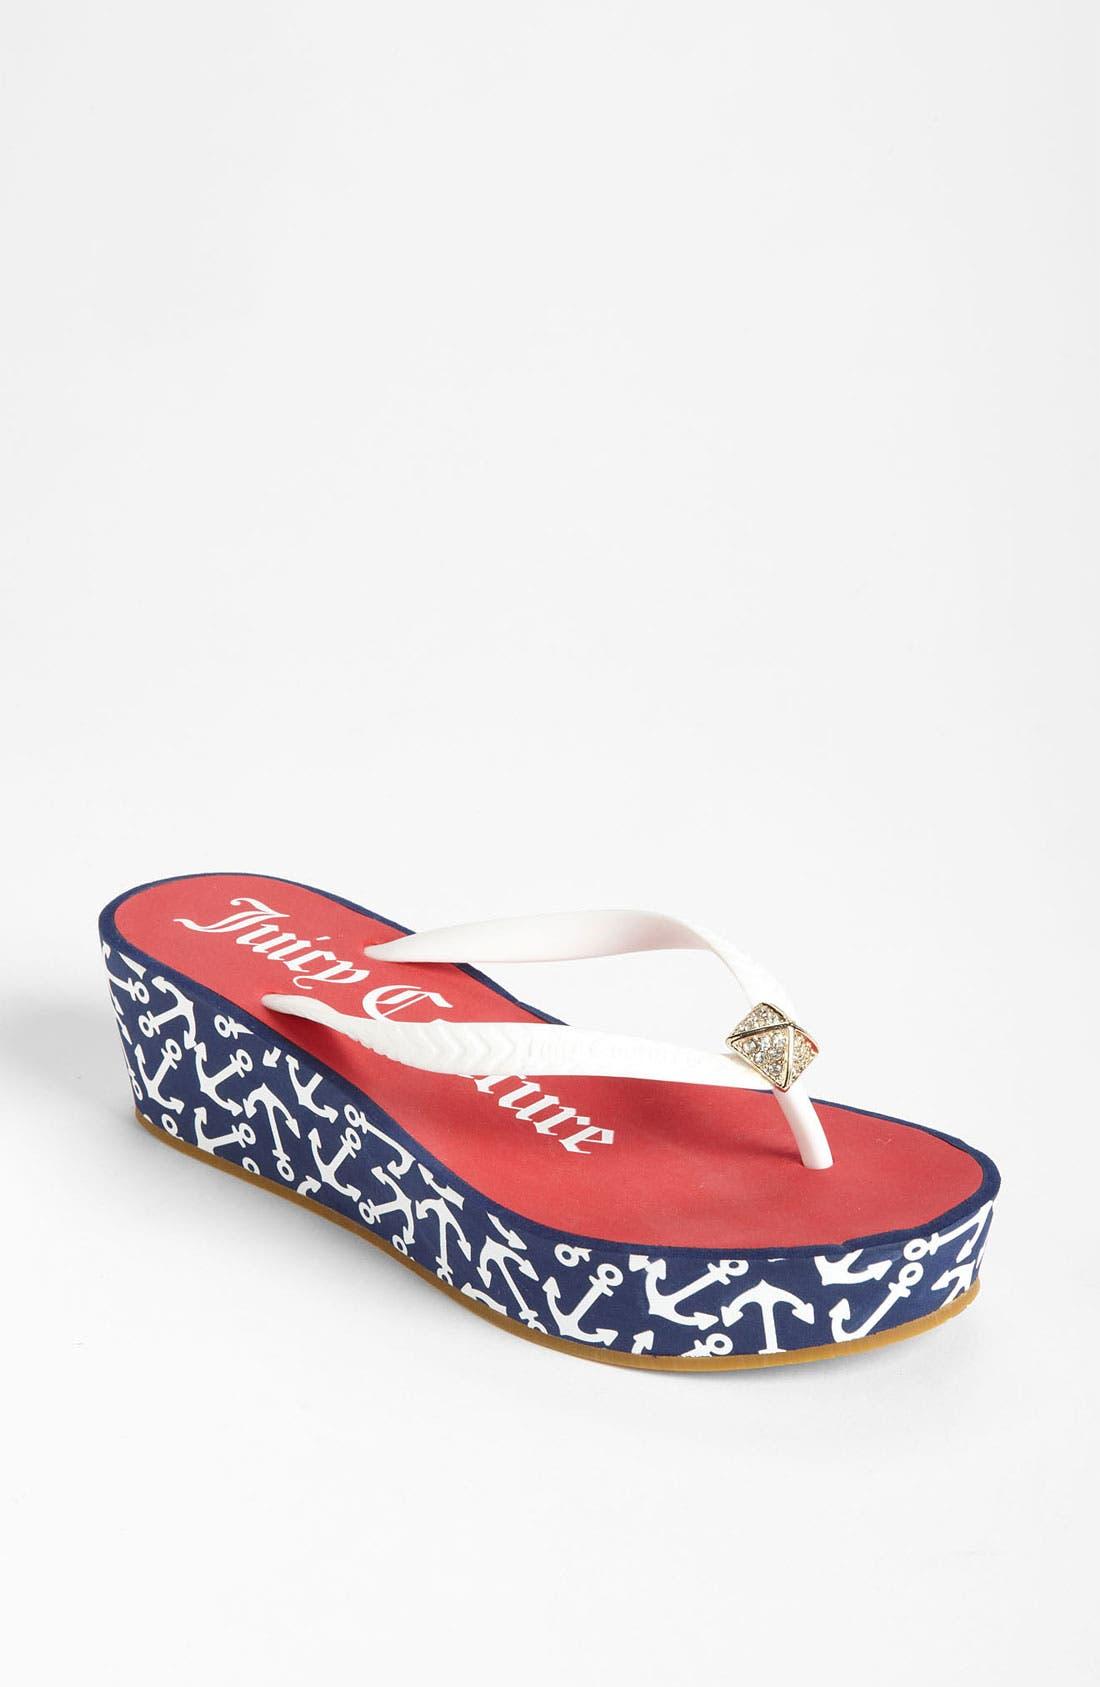 Main Image - Juicy Couture 'Irie' Flip Flop